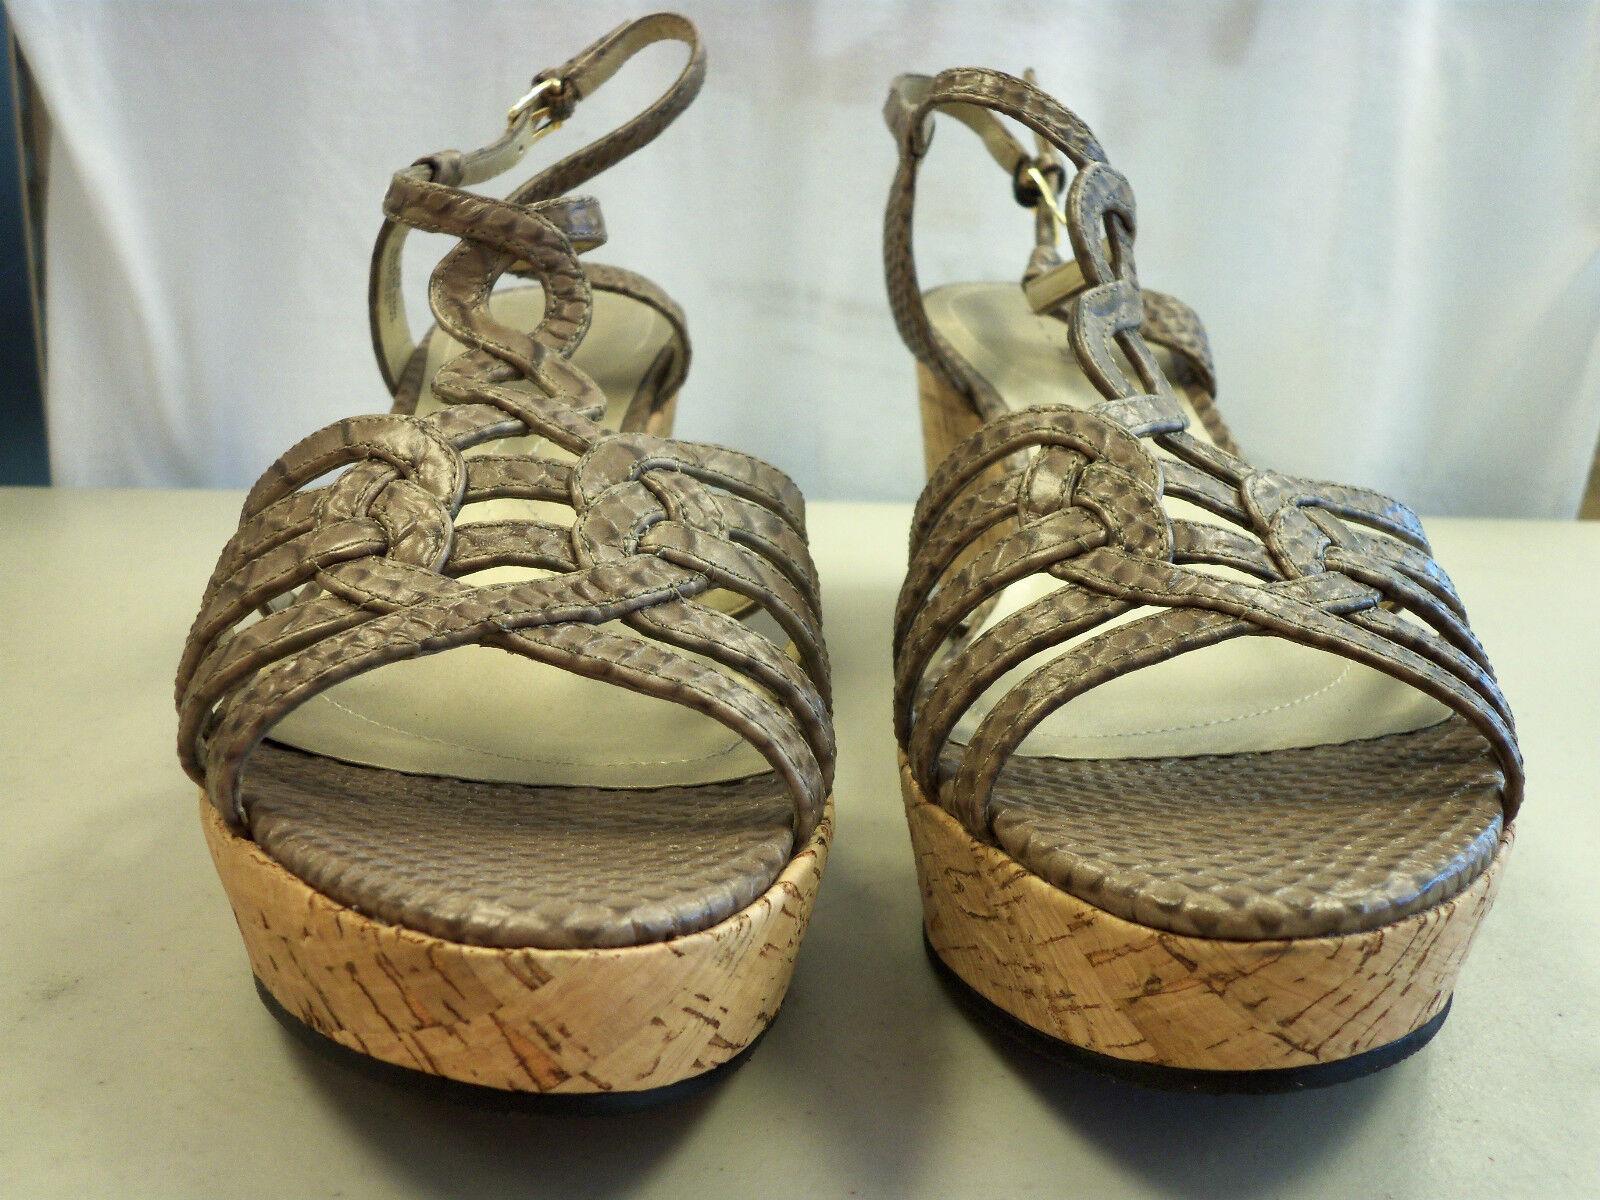 Tahari New New Tahari Donna Star Wedge Platform Sandal 9.5 M Shoes bcc1b2